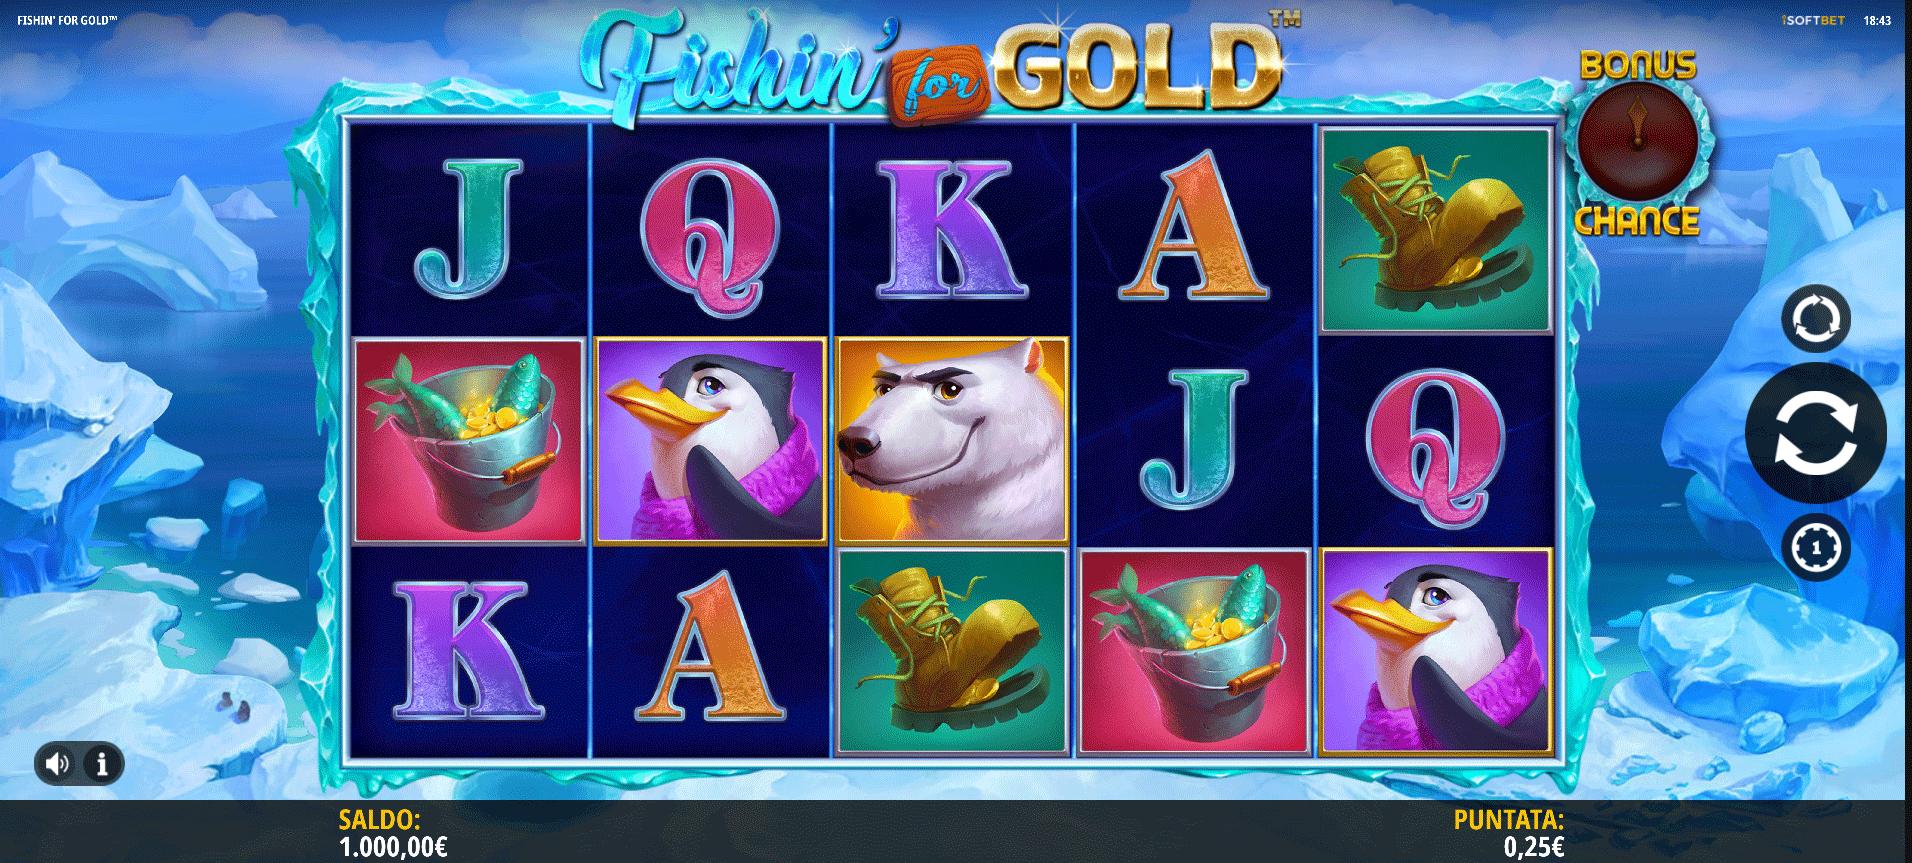 Slot Fishin For Gold